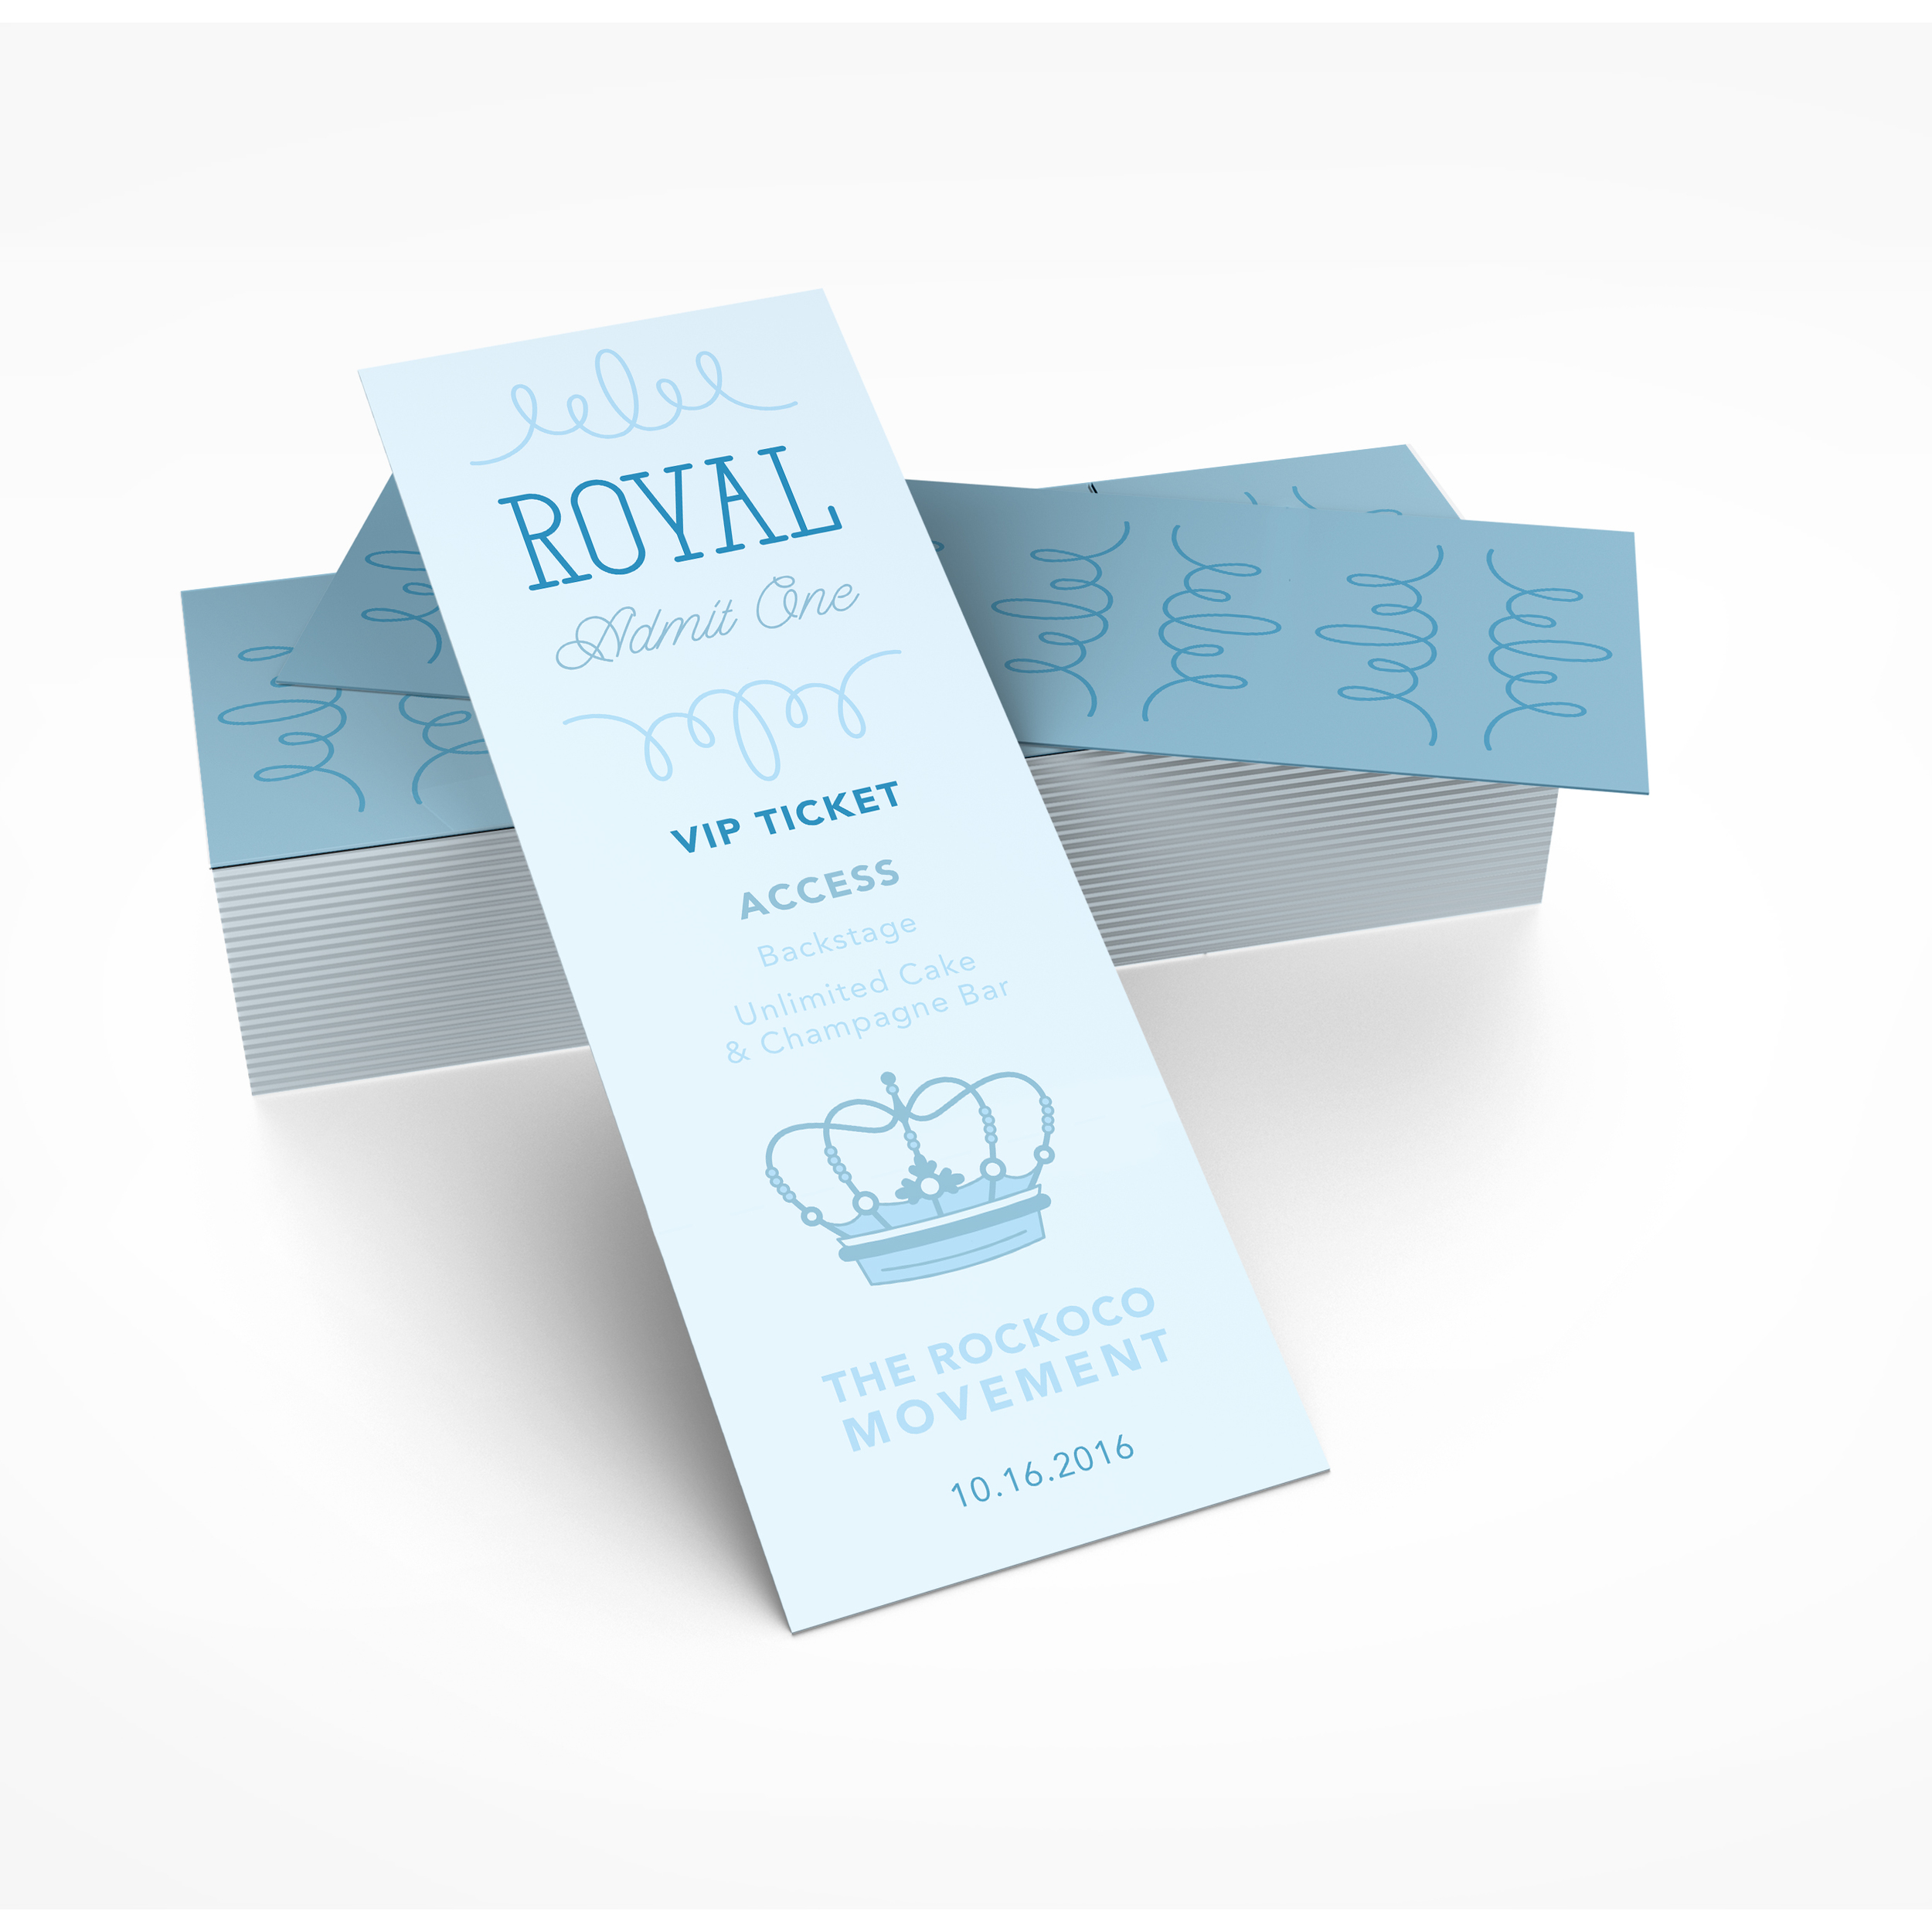 RoyalsTix.jpg